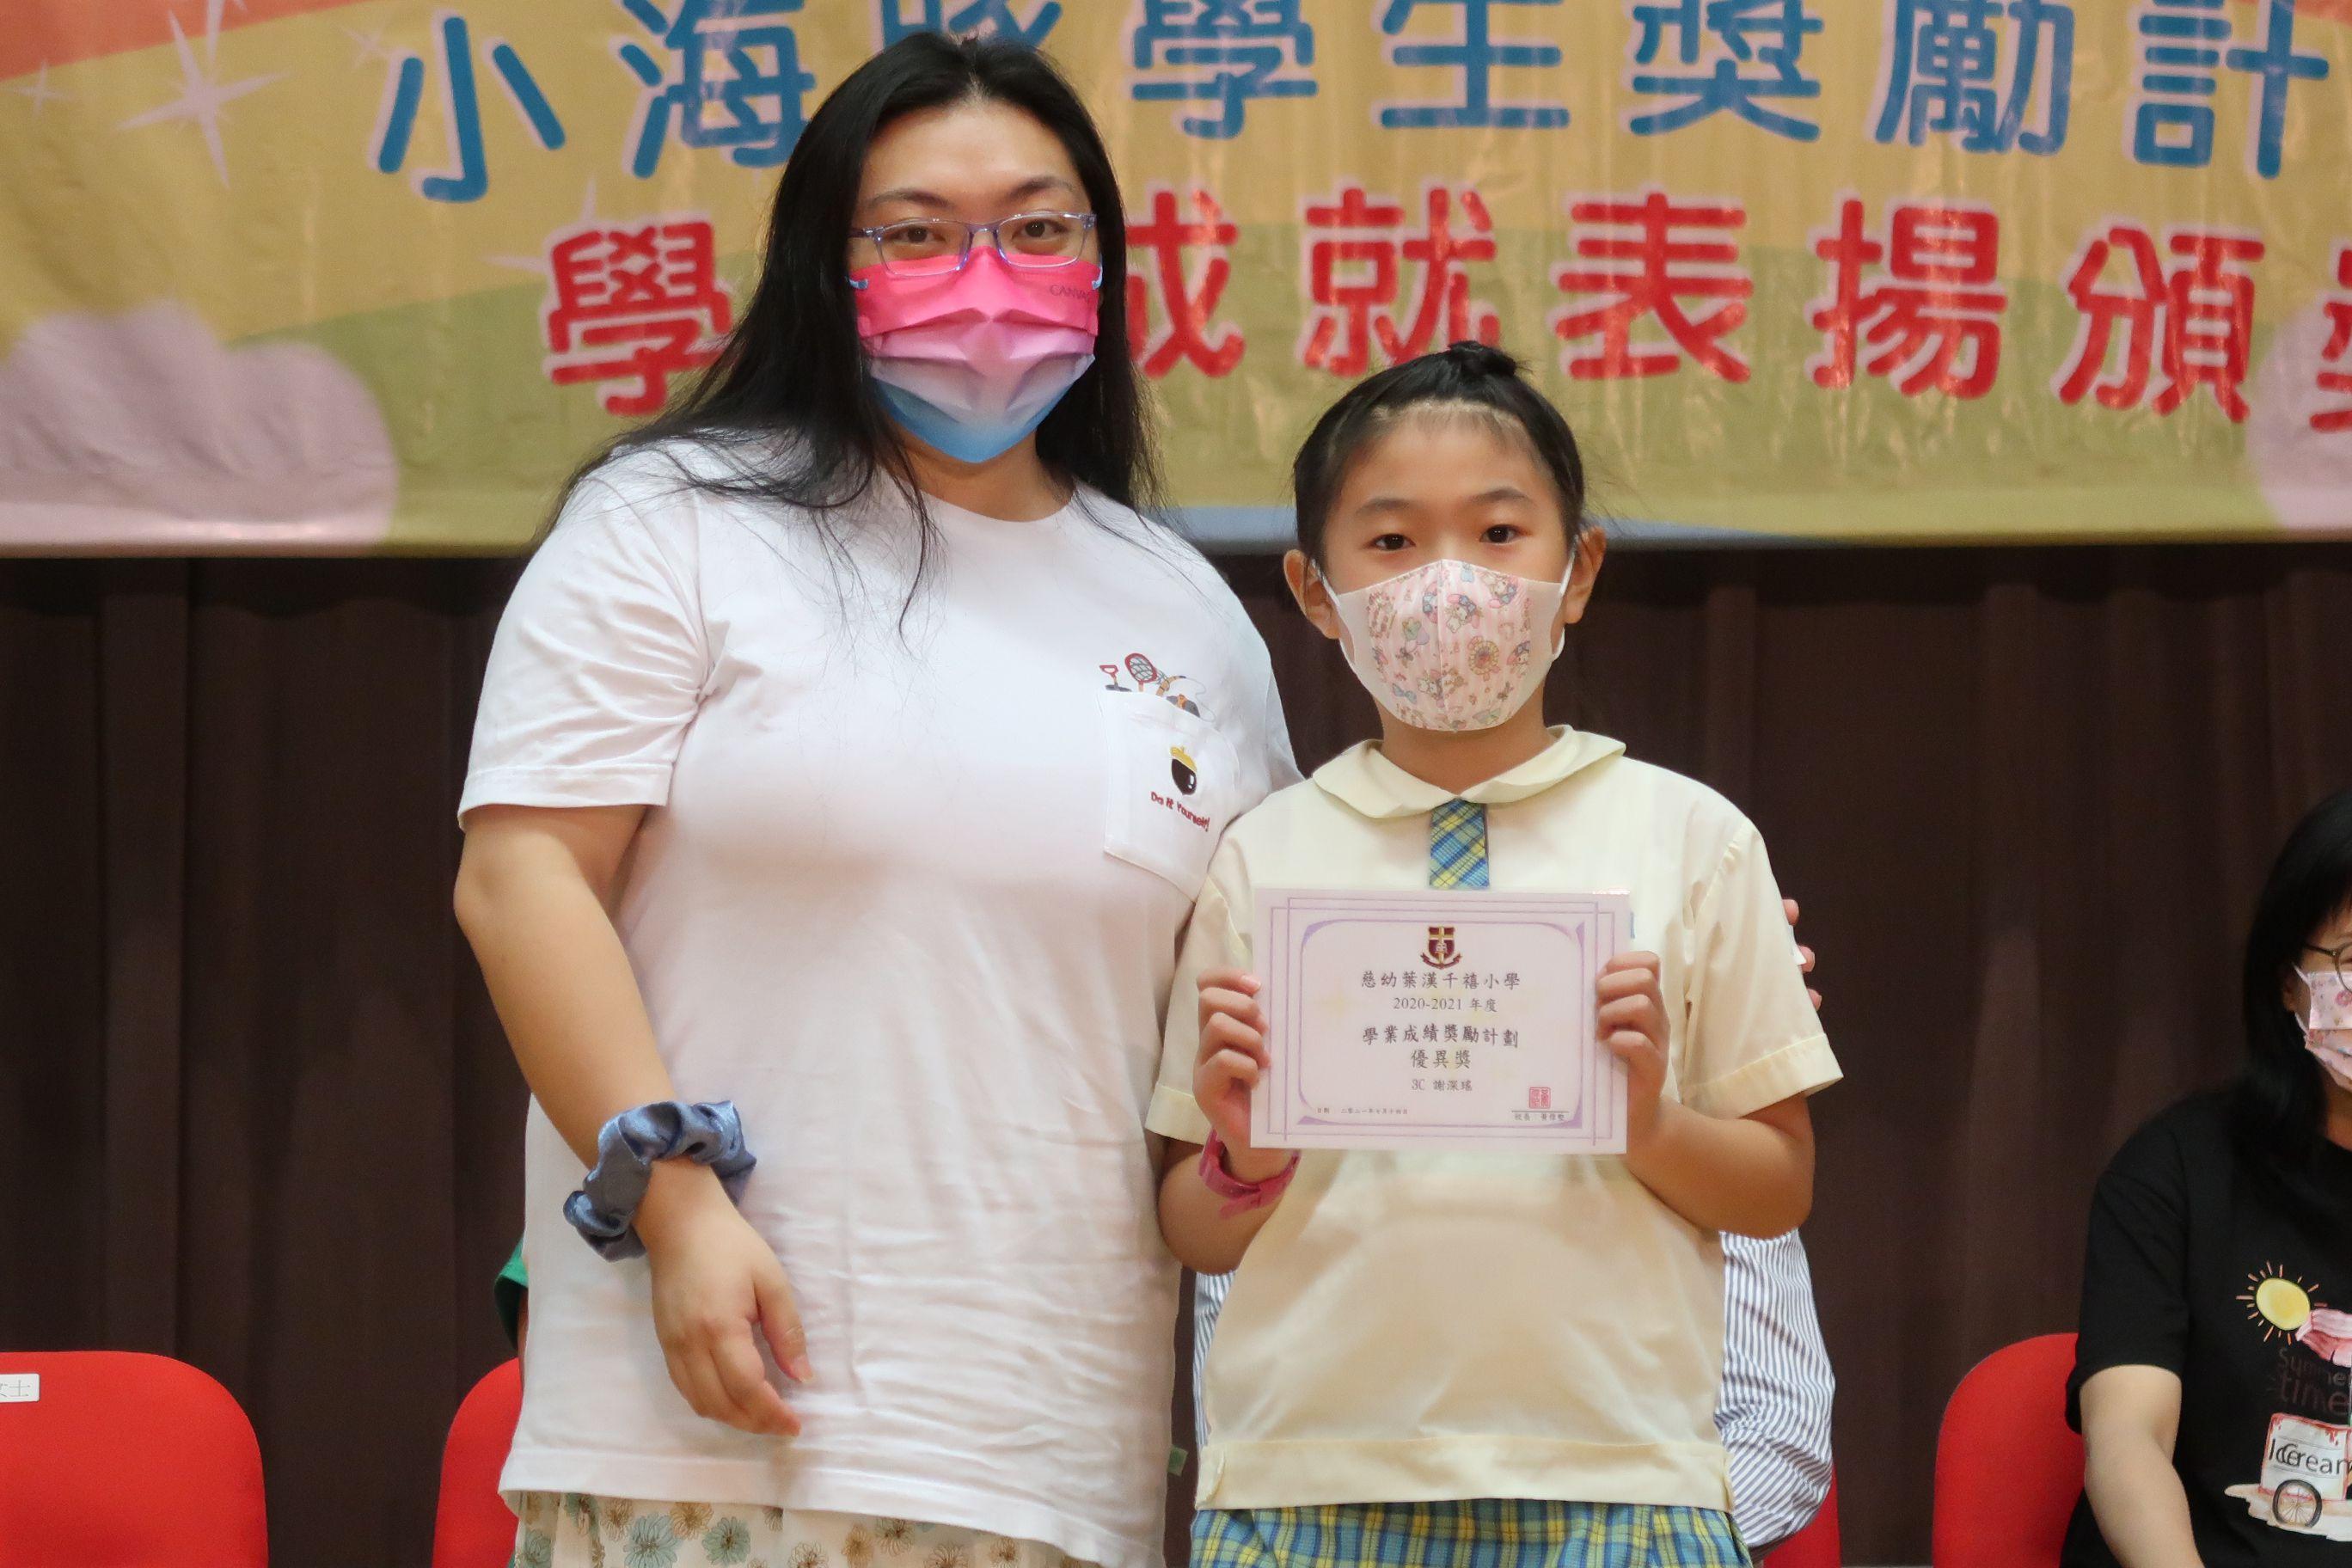 https://syh.edu.hk/sites/default/files/img_5569.jpg